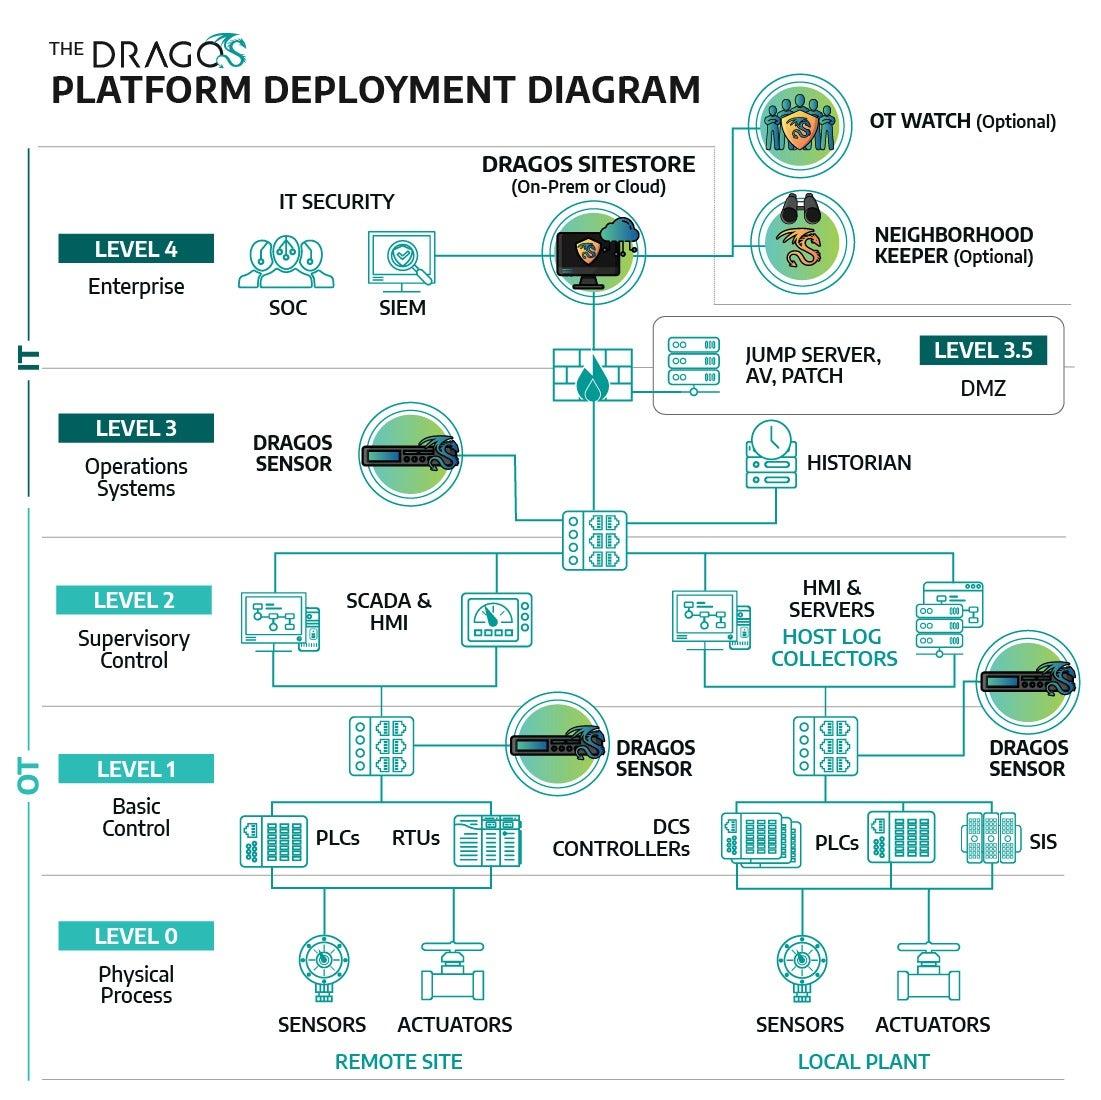 A diagram of the Dragos Platform including OT Watch